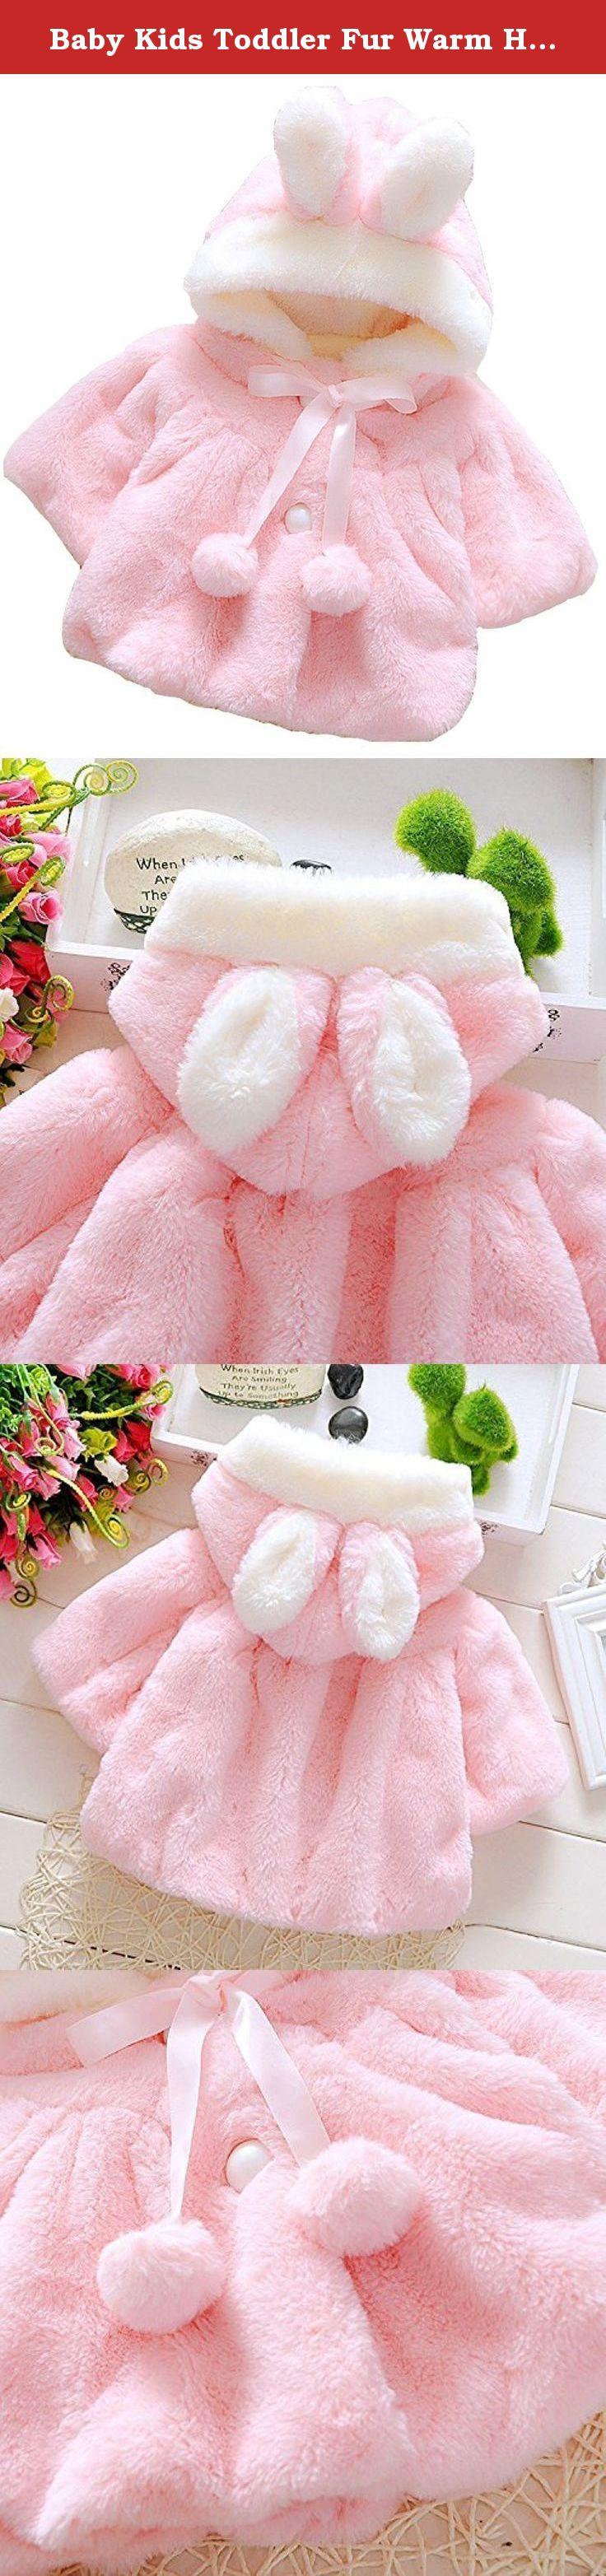 92c557705 Baby Kids Toddler Fur Warm Hooded Cape Cloak Poncho Hoodie Coat 12-18Months  Pink.